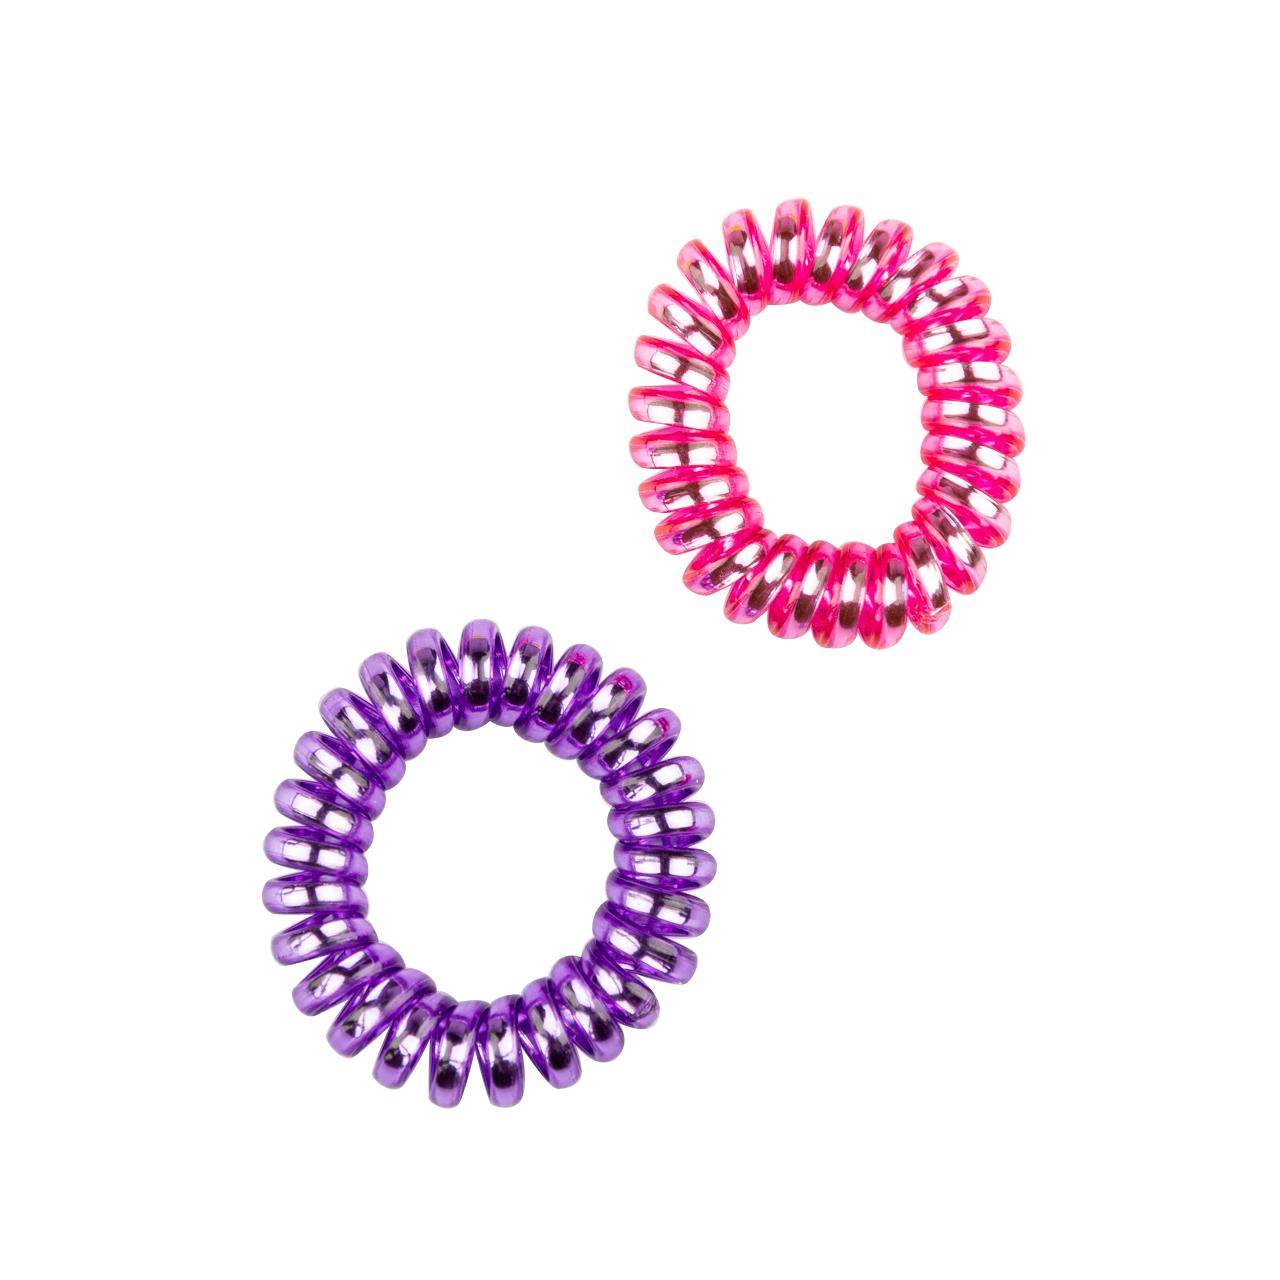 Scrunchy Spring Rubber Set 2 Pcs Purple-Pink